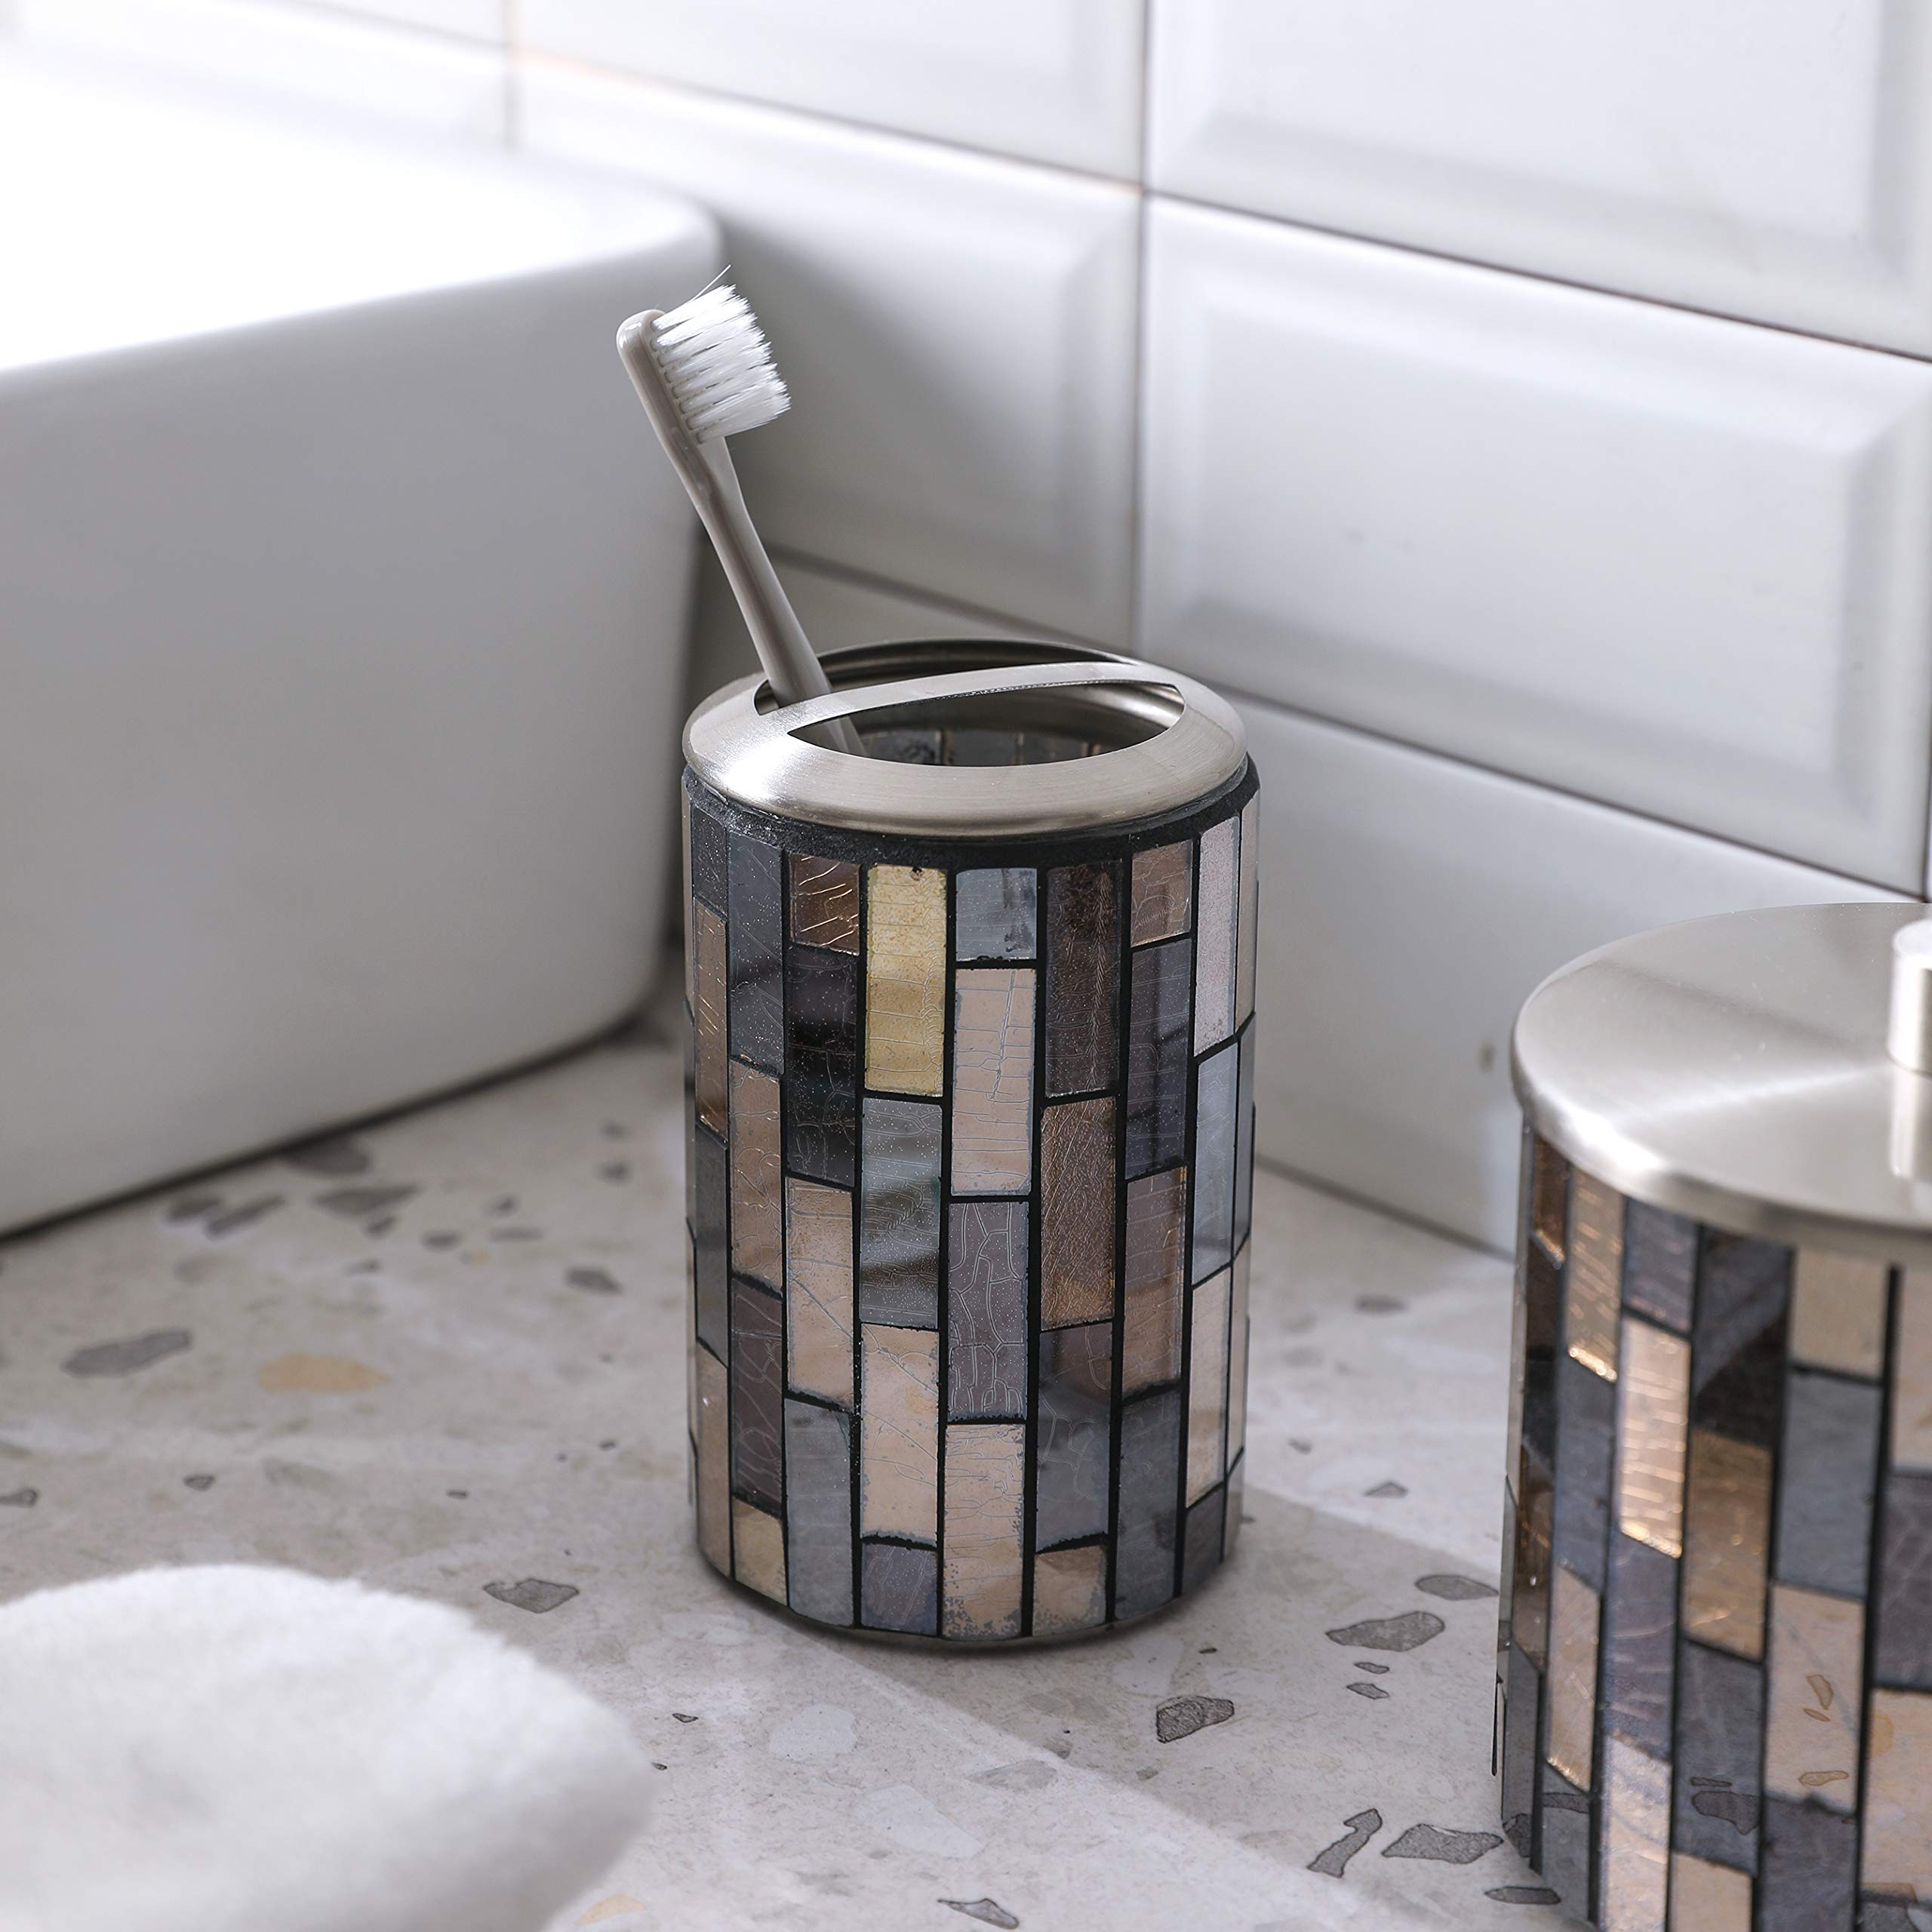 Whole Housewares Bathroom Accessory Sets Black Gold Mosaic Glass Bathroom Accessories Black Gold 1 Buy Online In Bosnia And Herzegovina At Bosnia Desertcart Com Productid 180005508